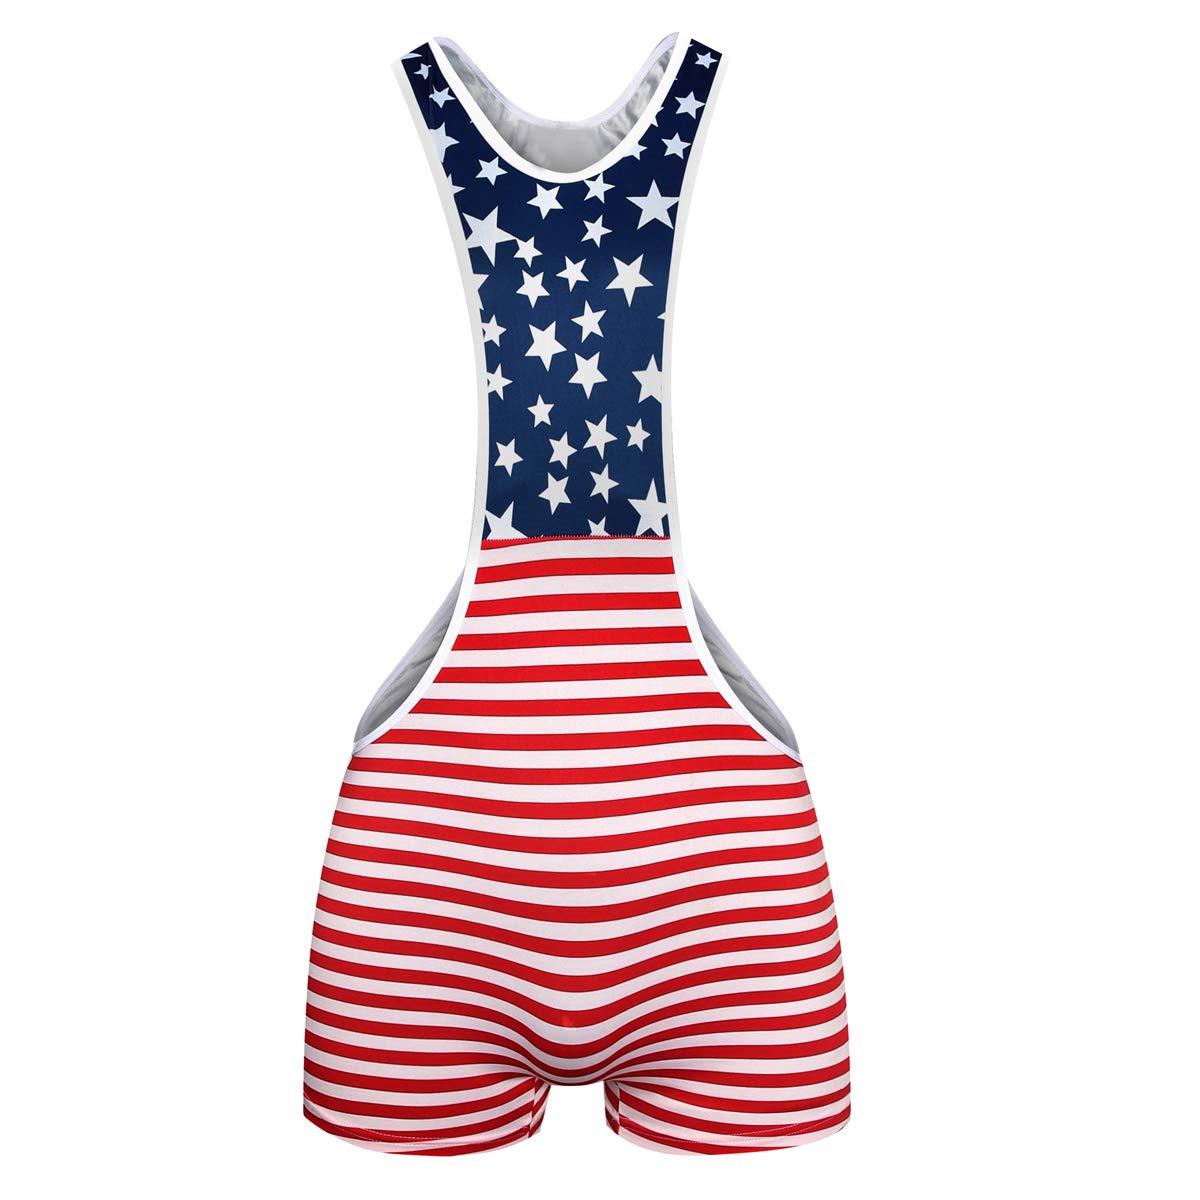 Men's Jockstrap Leotard Underwear Mens Amercian Flag Jumpsuits Wrestling Singlet Athletic Supporters